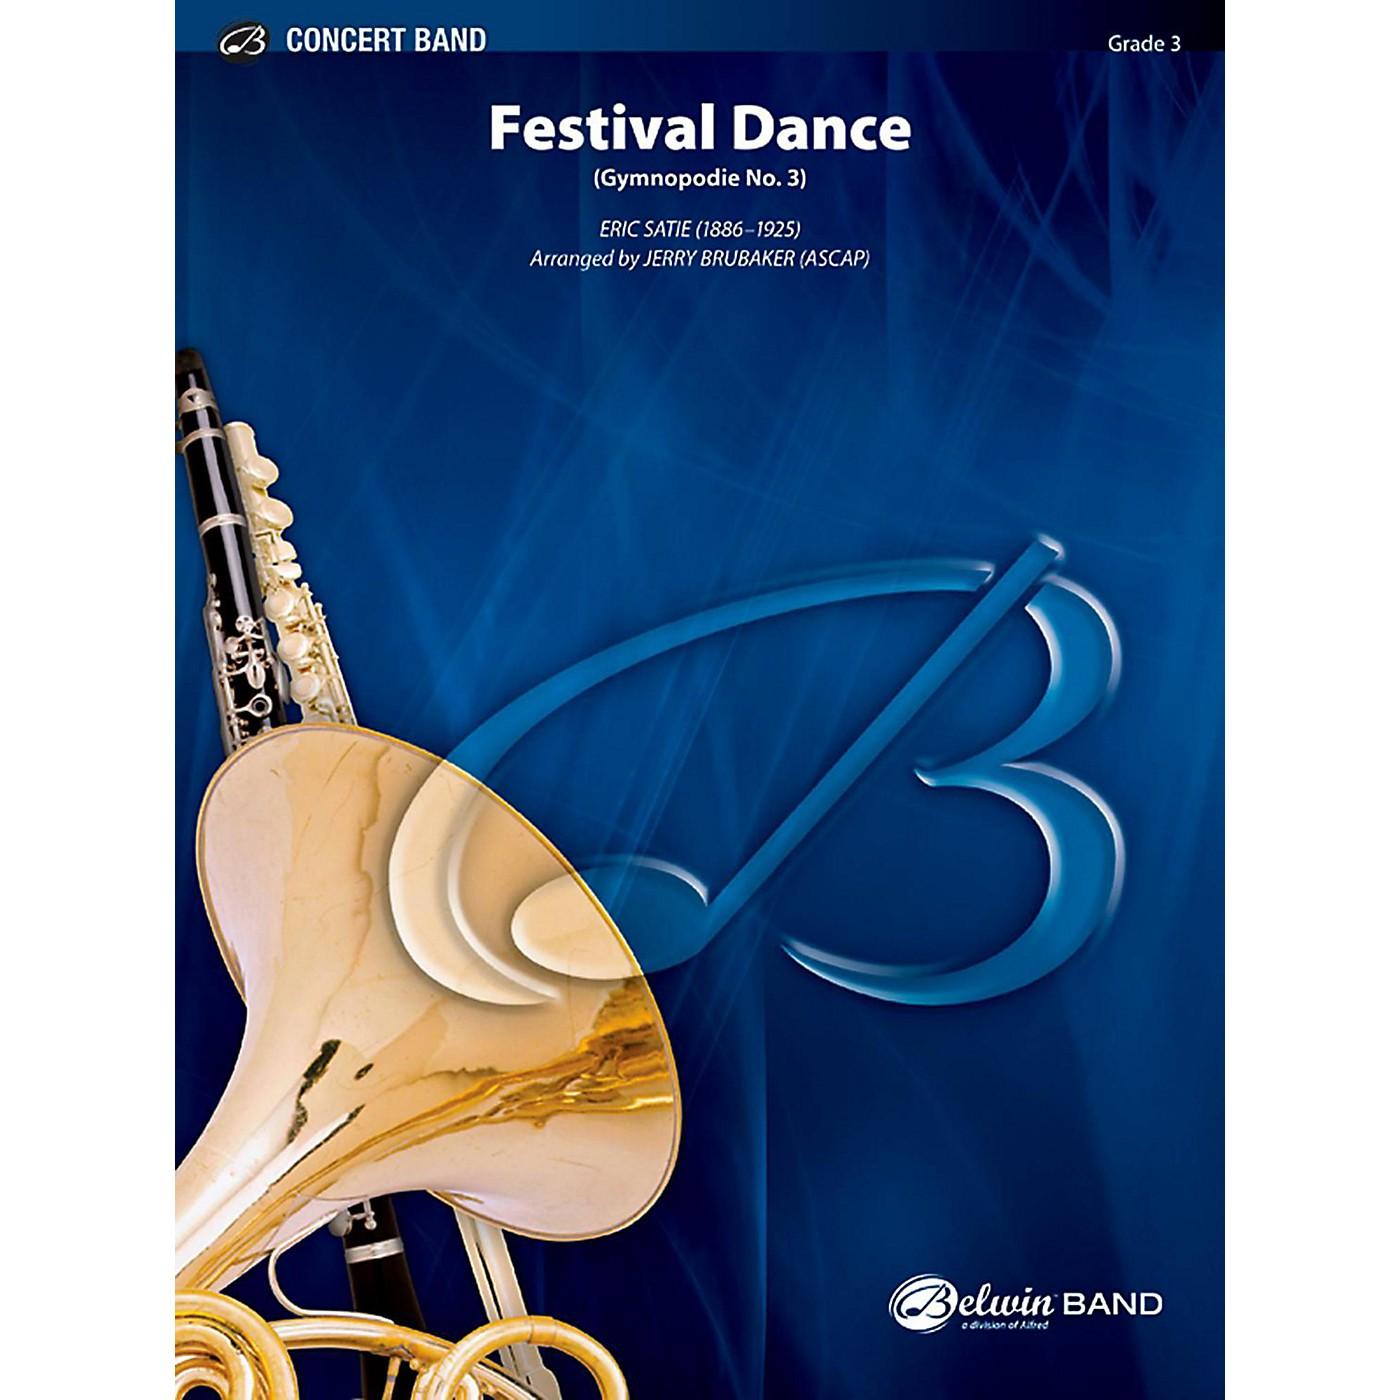 BELWIN Festival Dance Concert Band Grade 3 (Medium Easy) thumbnail